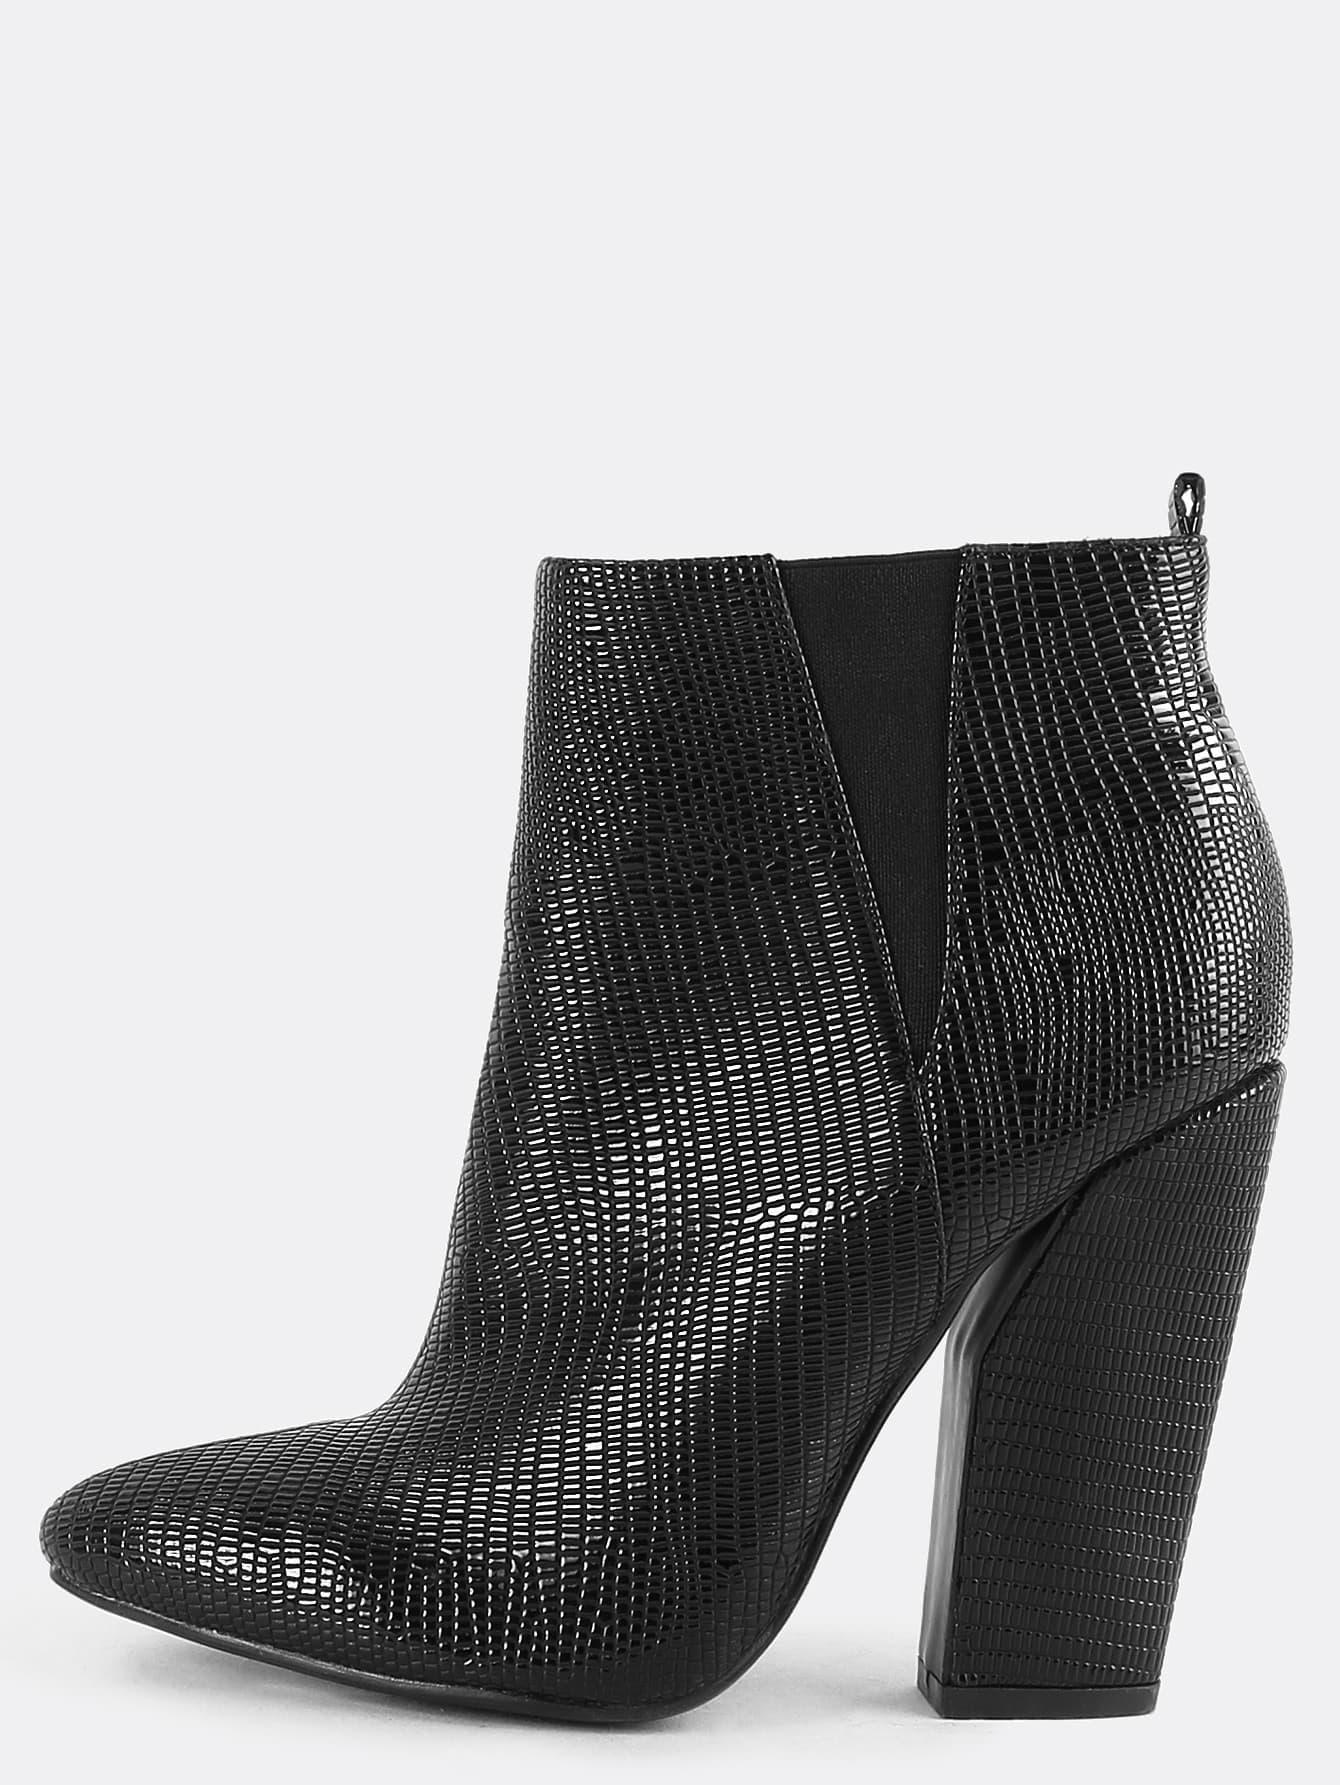 Фото Pointy Toe Snake Ankle Booties BLACK. Купить с доставкой